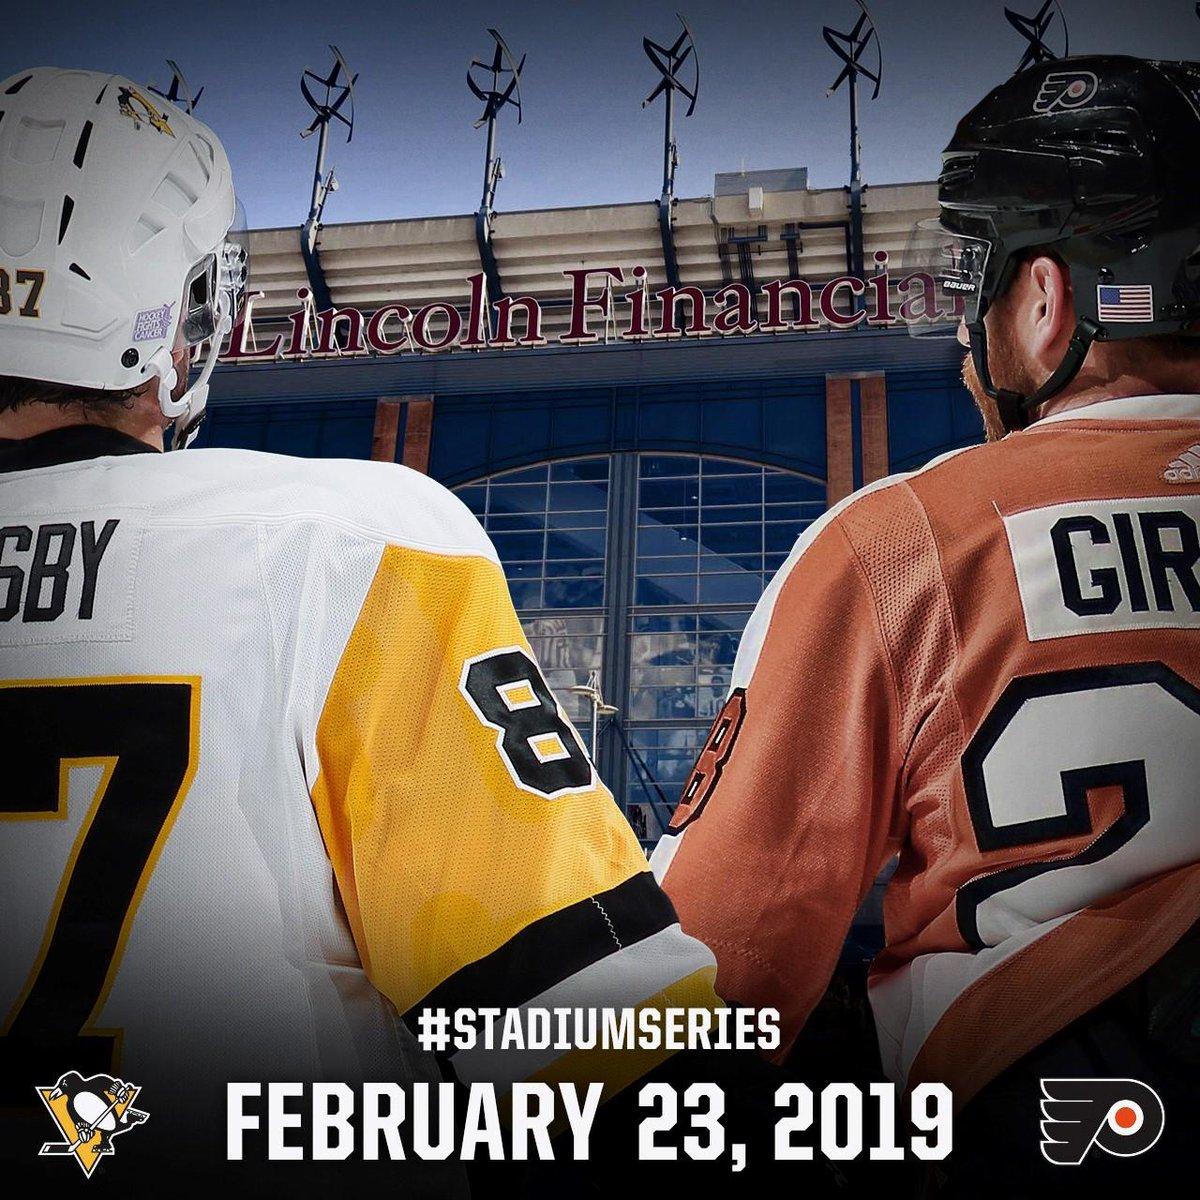 274fb2874 NHL on Twitter: